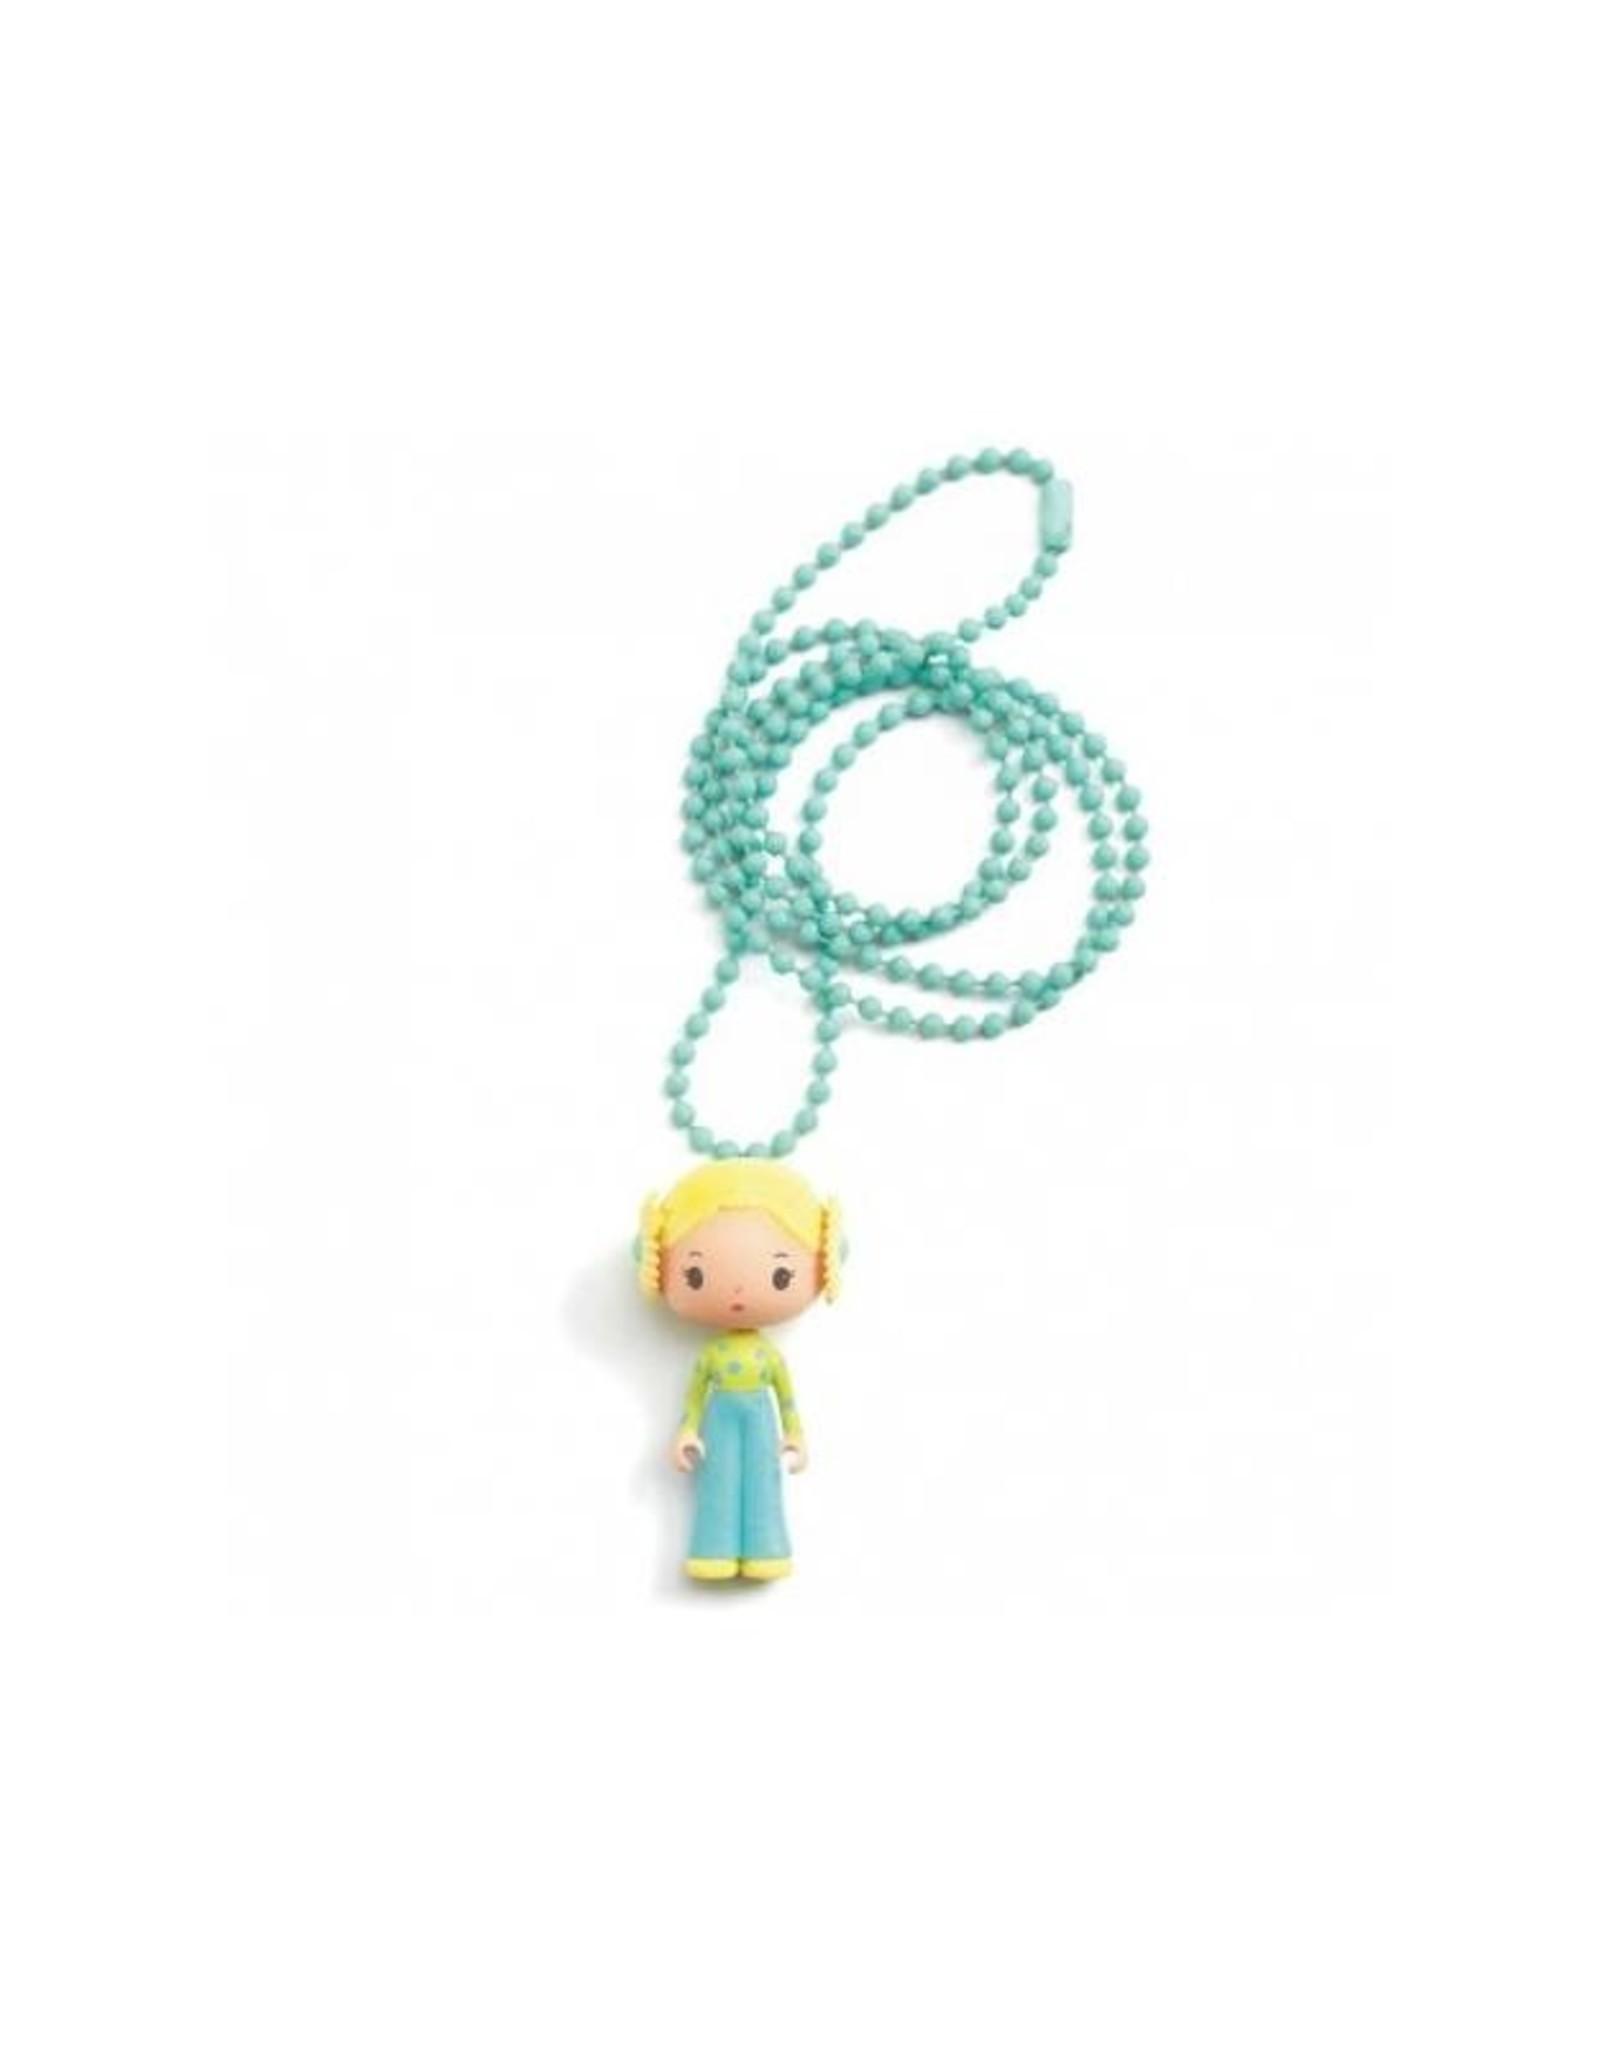 Djeco Tinyly Flore Necklace